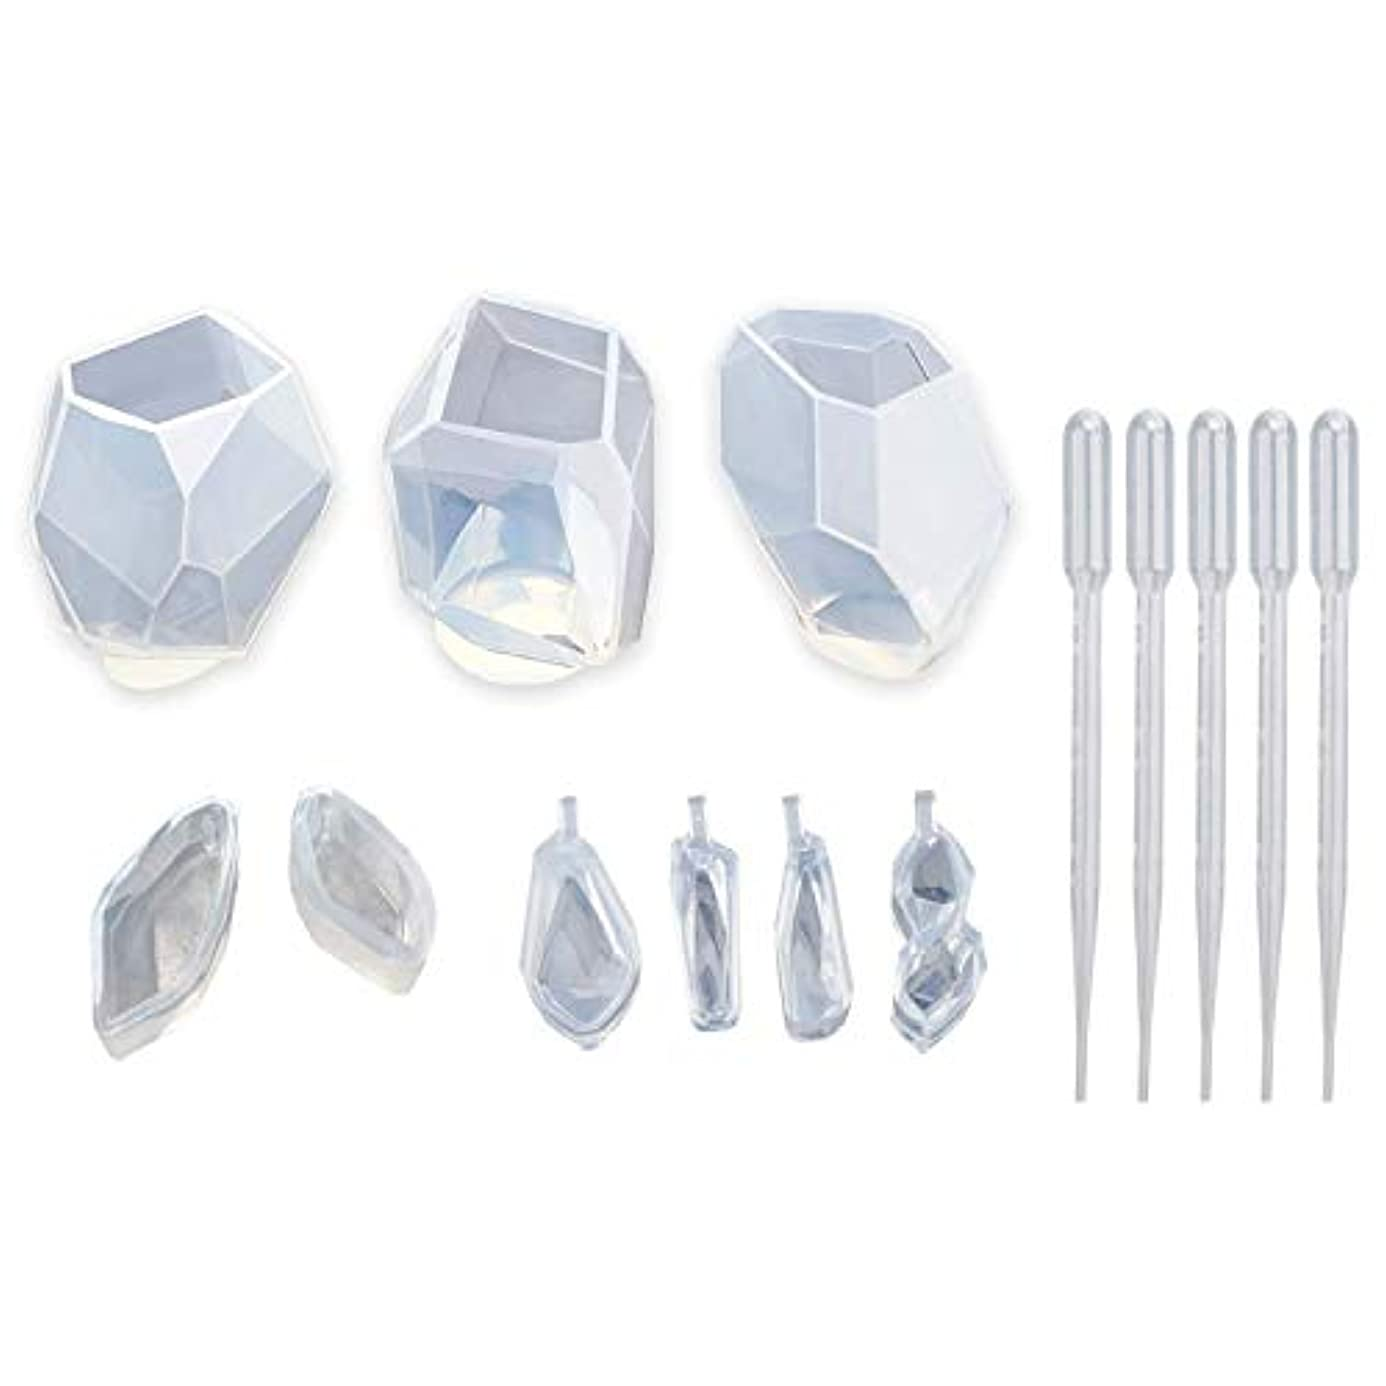 RETYLY 樹脂用シリコーンモールド 9個樹脂モールド 水晶石形状樹脂ジュエリーモールド ジュエリー鋳造モールド 宝石類ネックレス/蝋燭/石鹸作り用 家装飾品